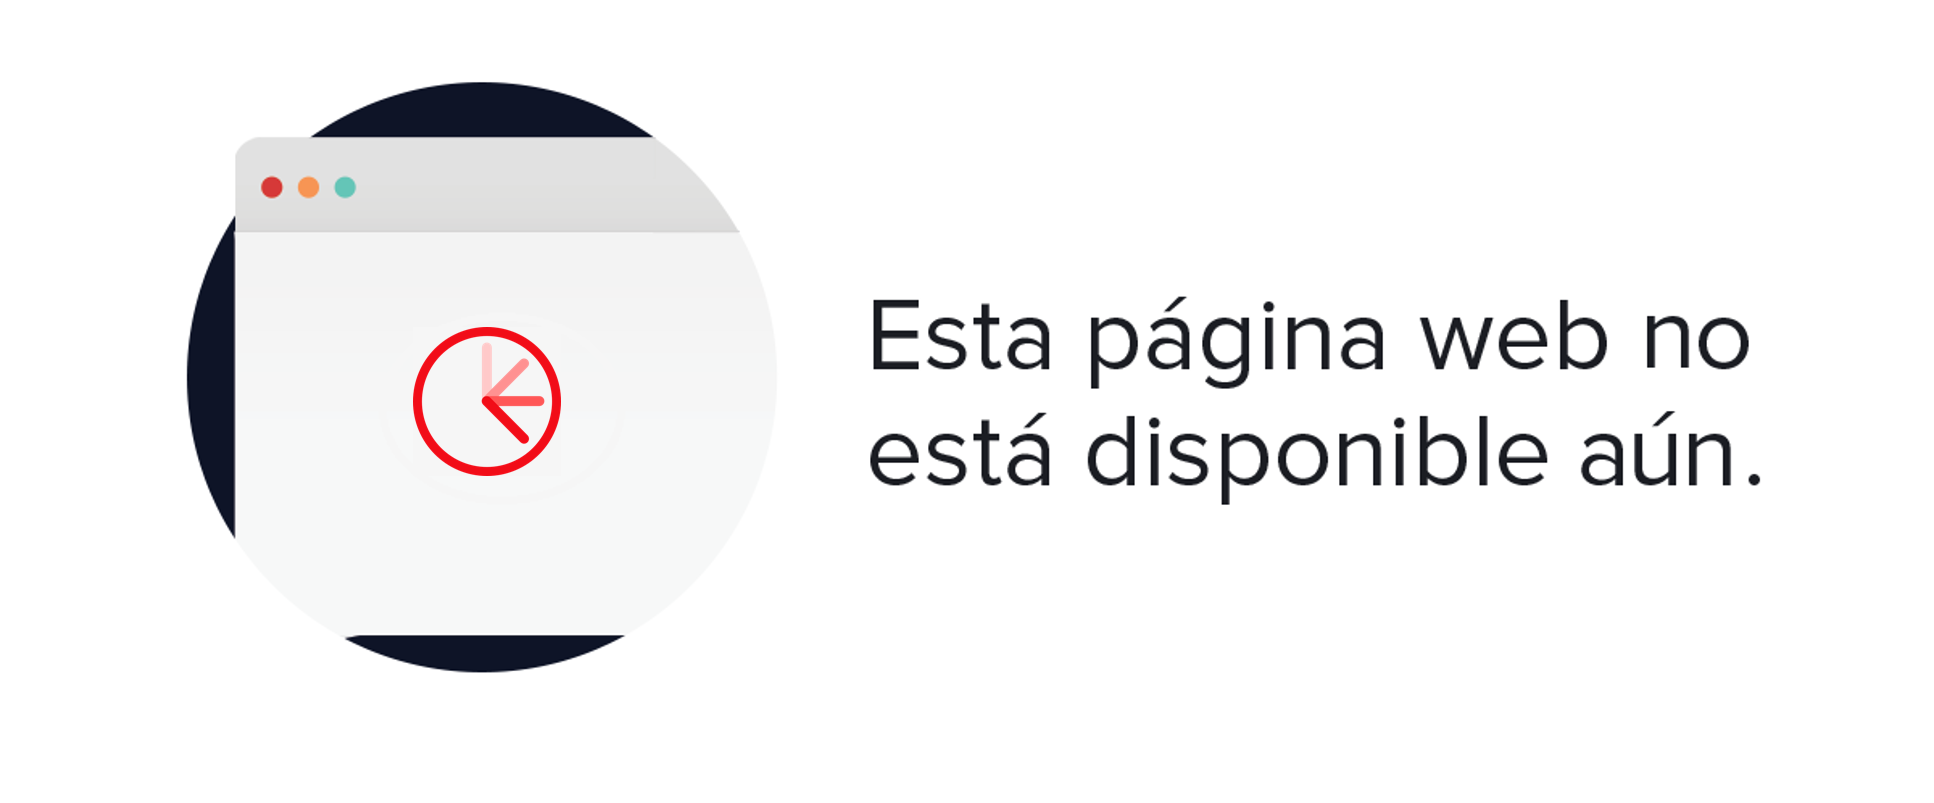 Nuevo : Officine Creative - botas Ikon ID de la Marca:IKON035NOVAKTINTO - FOCLPAU - Botas Hombre